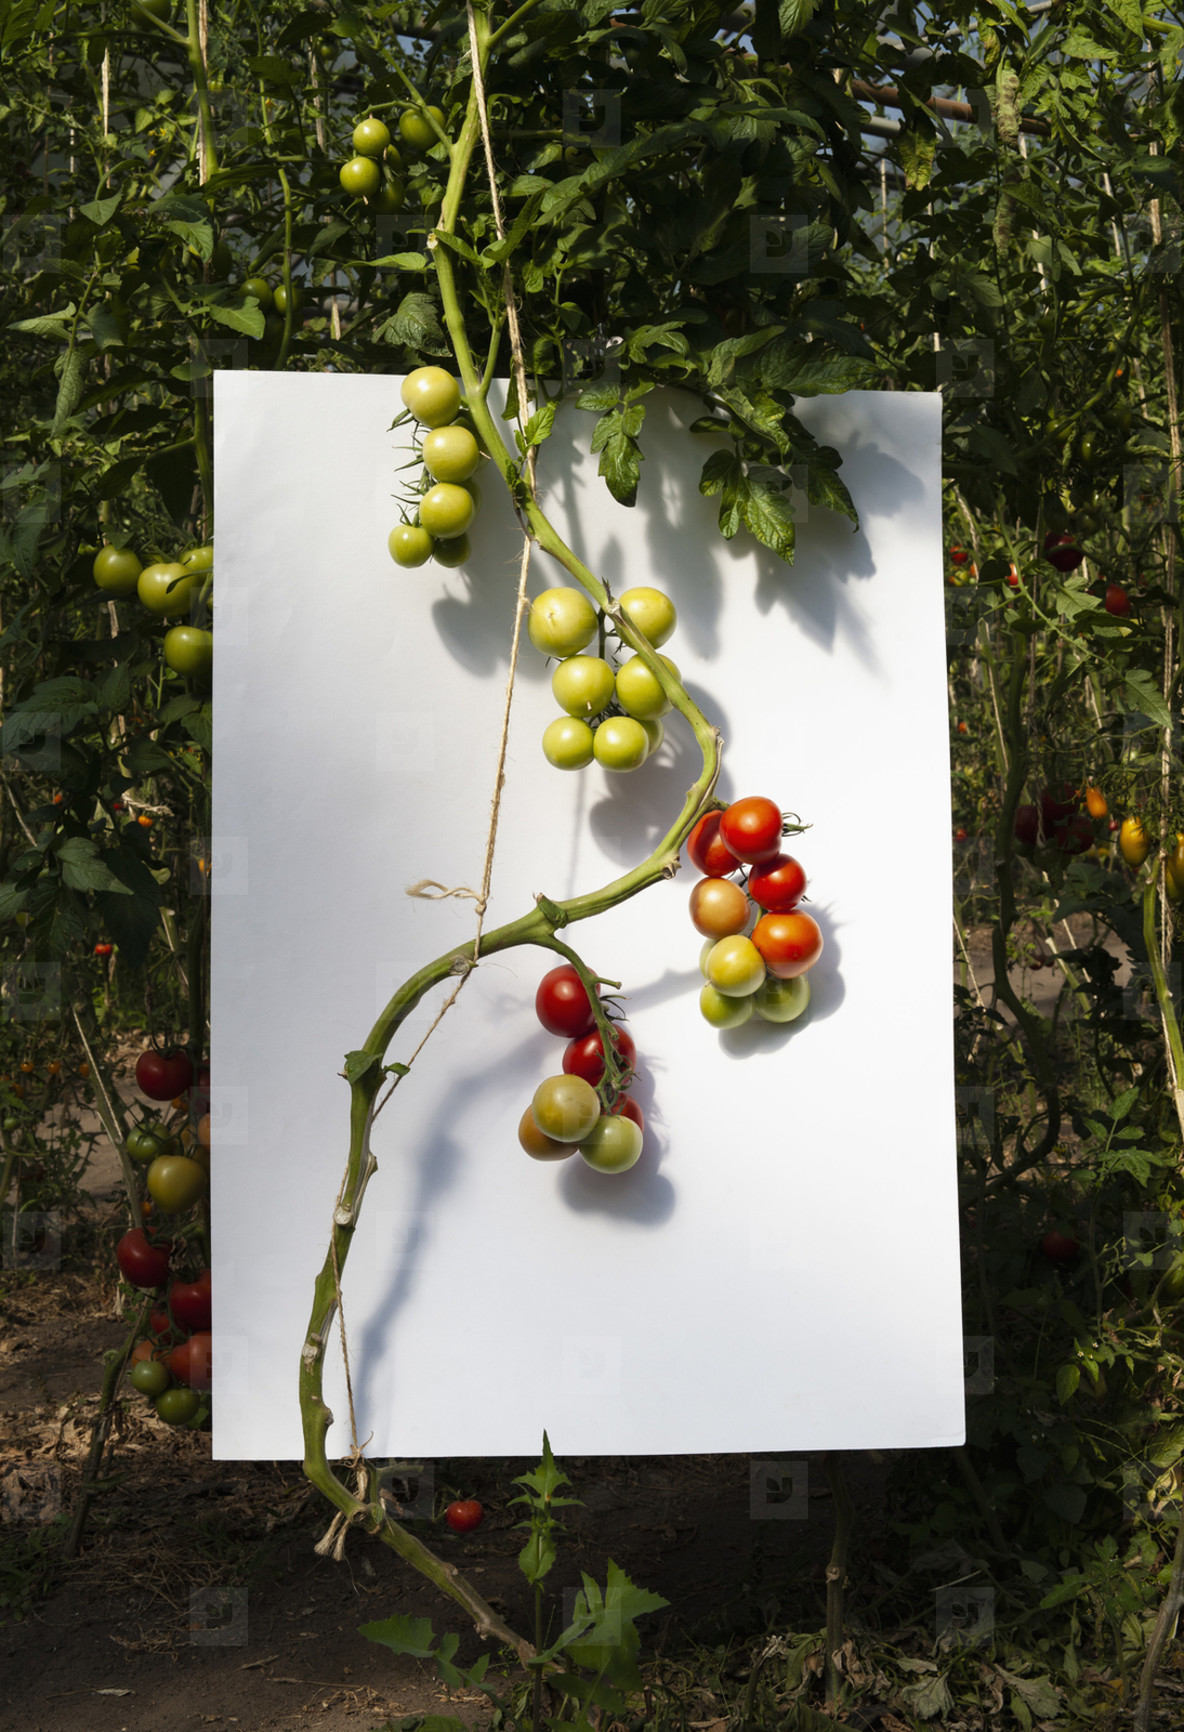 Ripening vine tomatoes against white background in garden